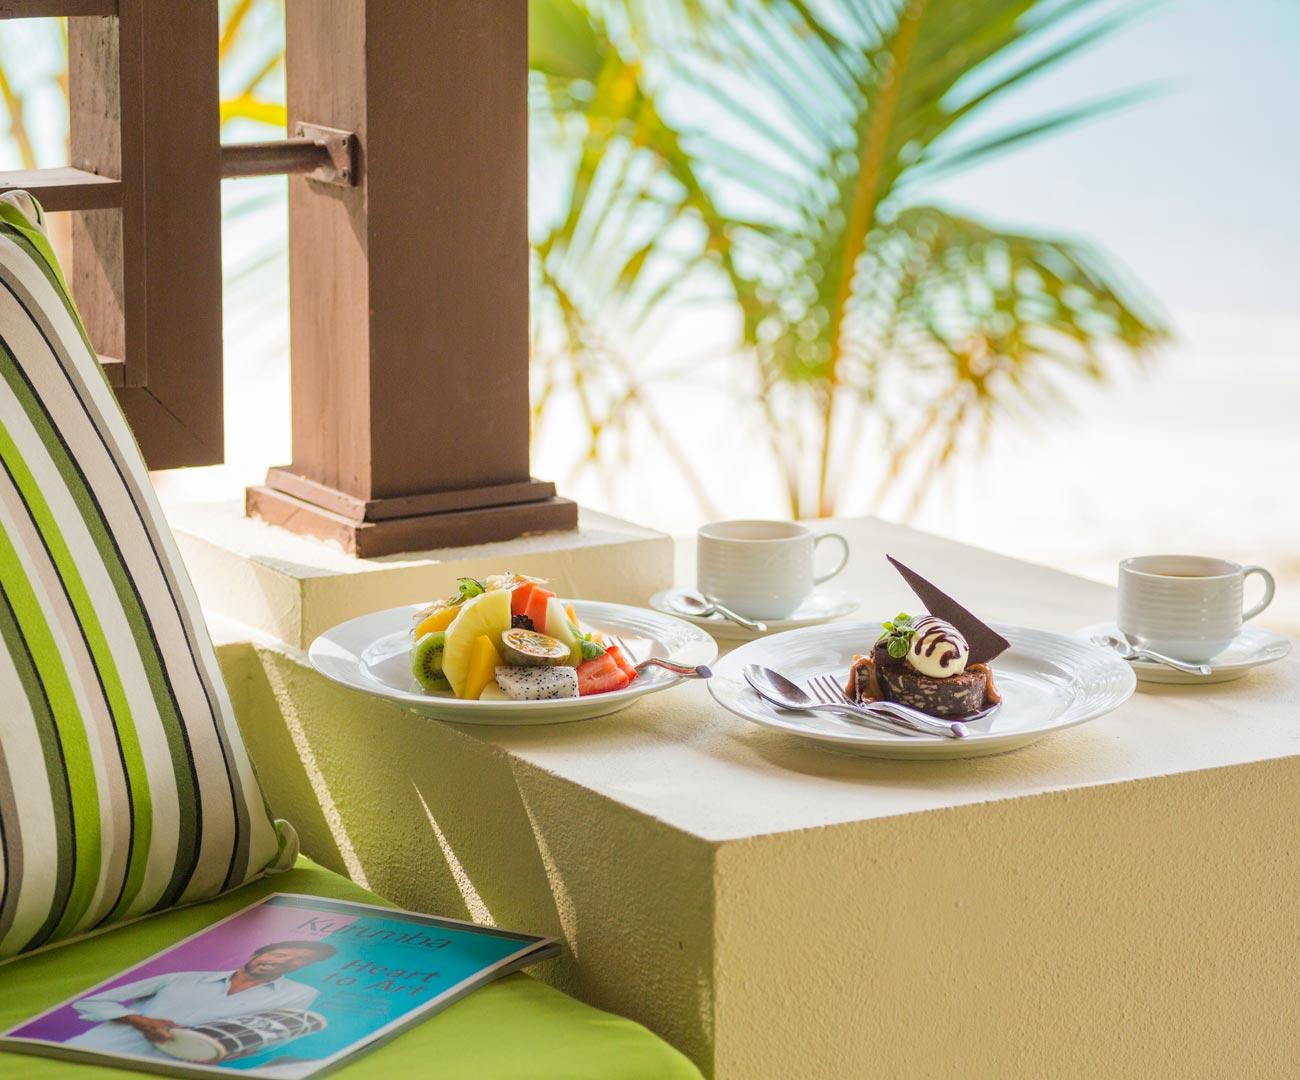 Room Service Image - Kurumba Maldives